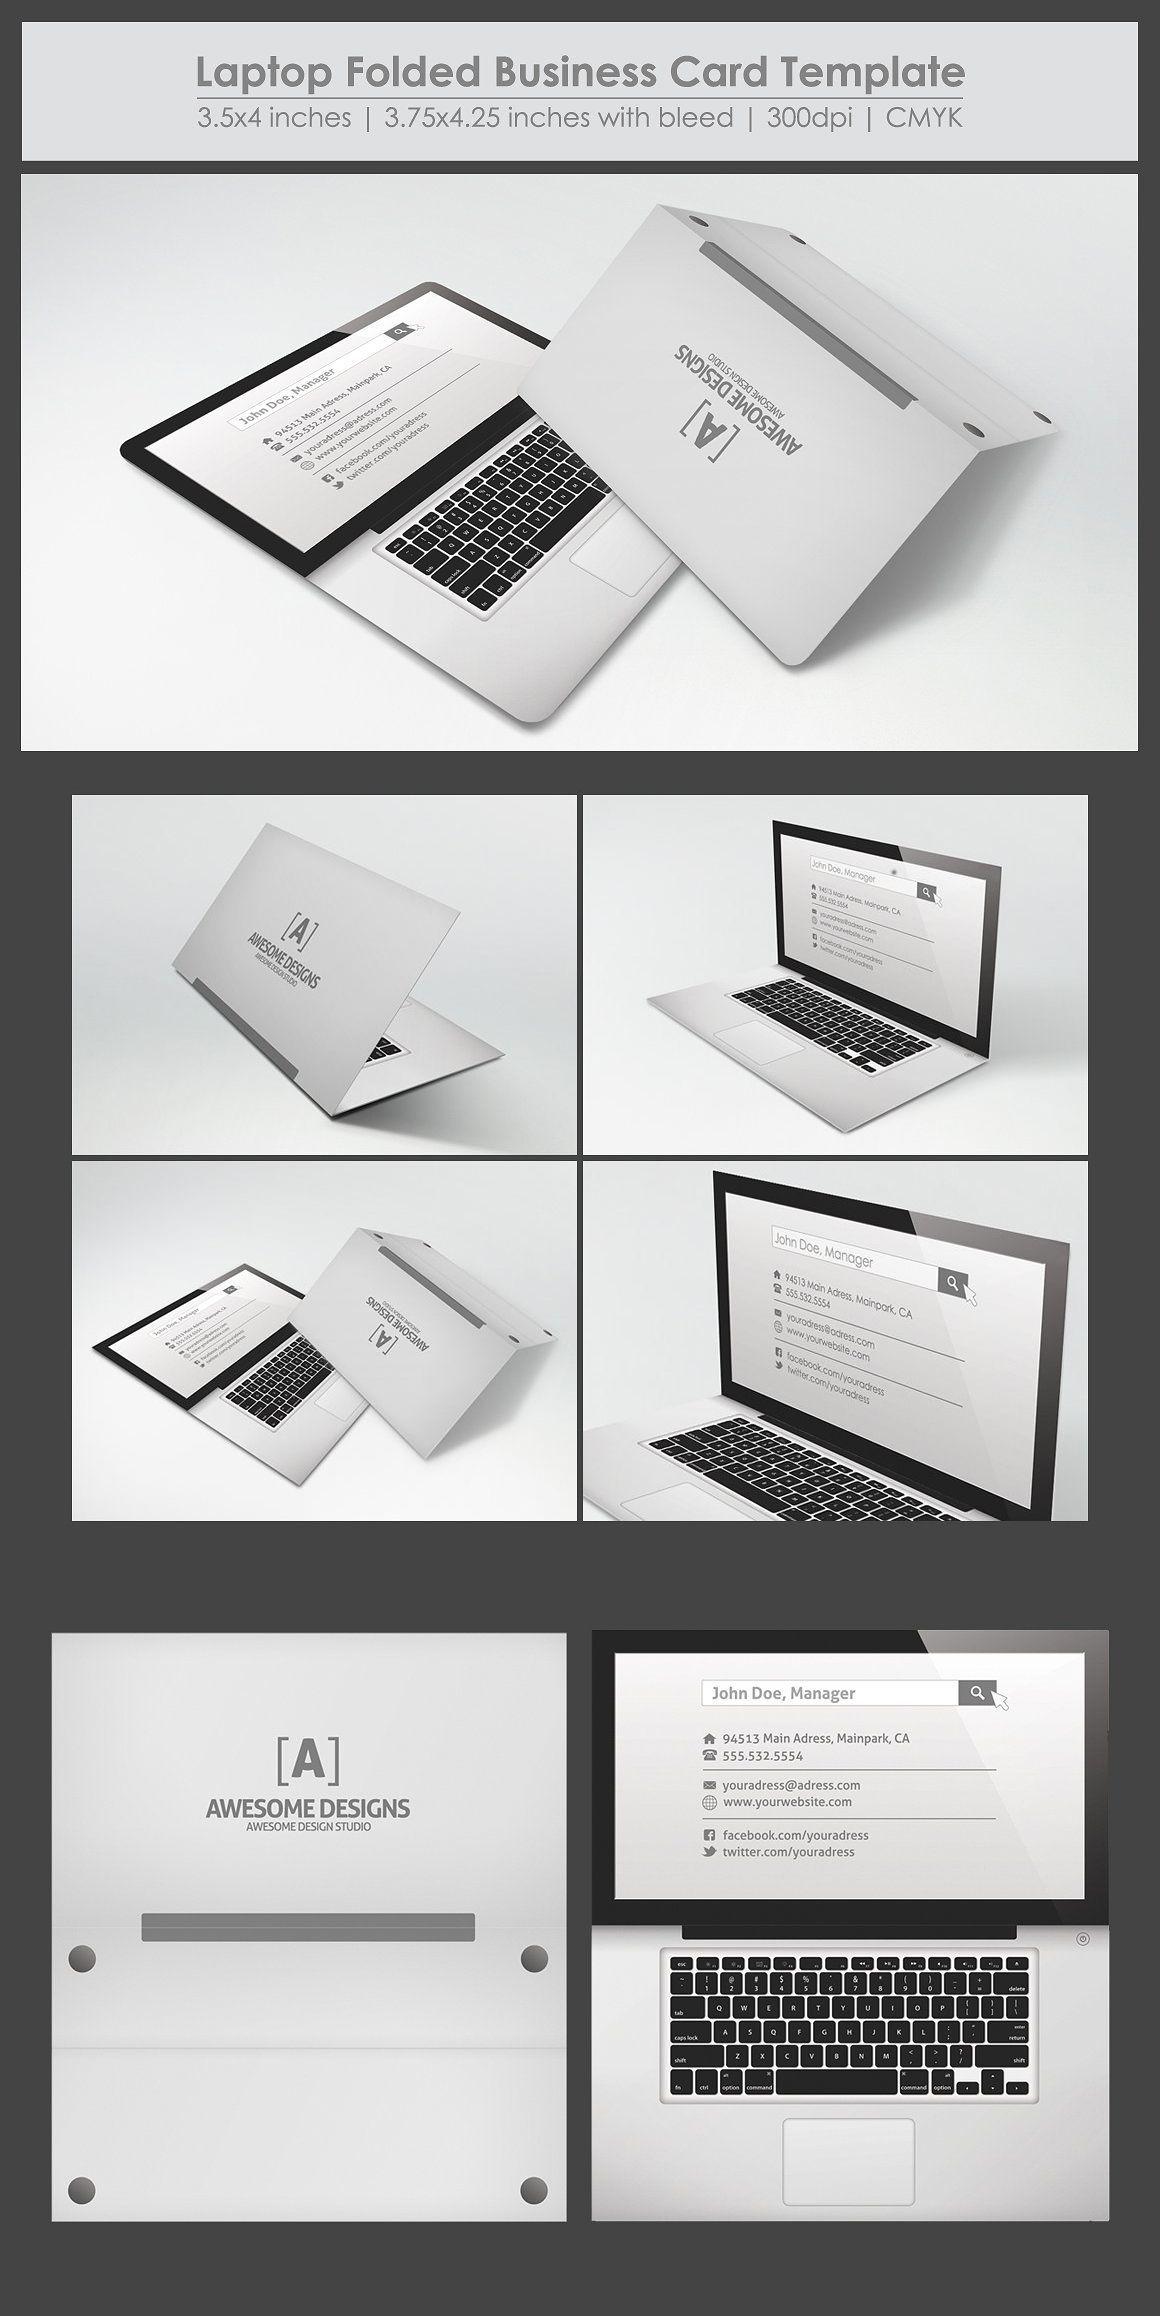 Laptop Folded Business Card Template #BestBusinessCards | Best ...